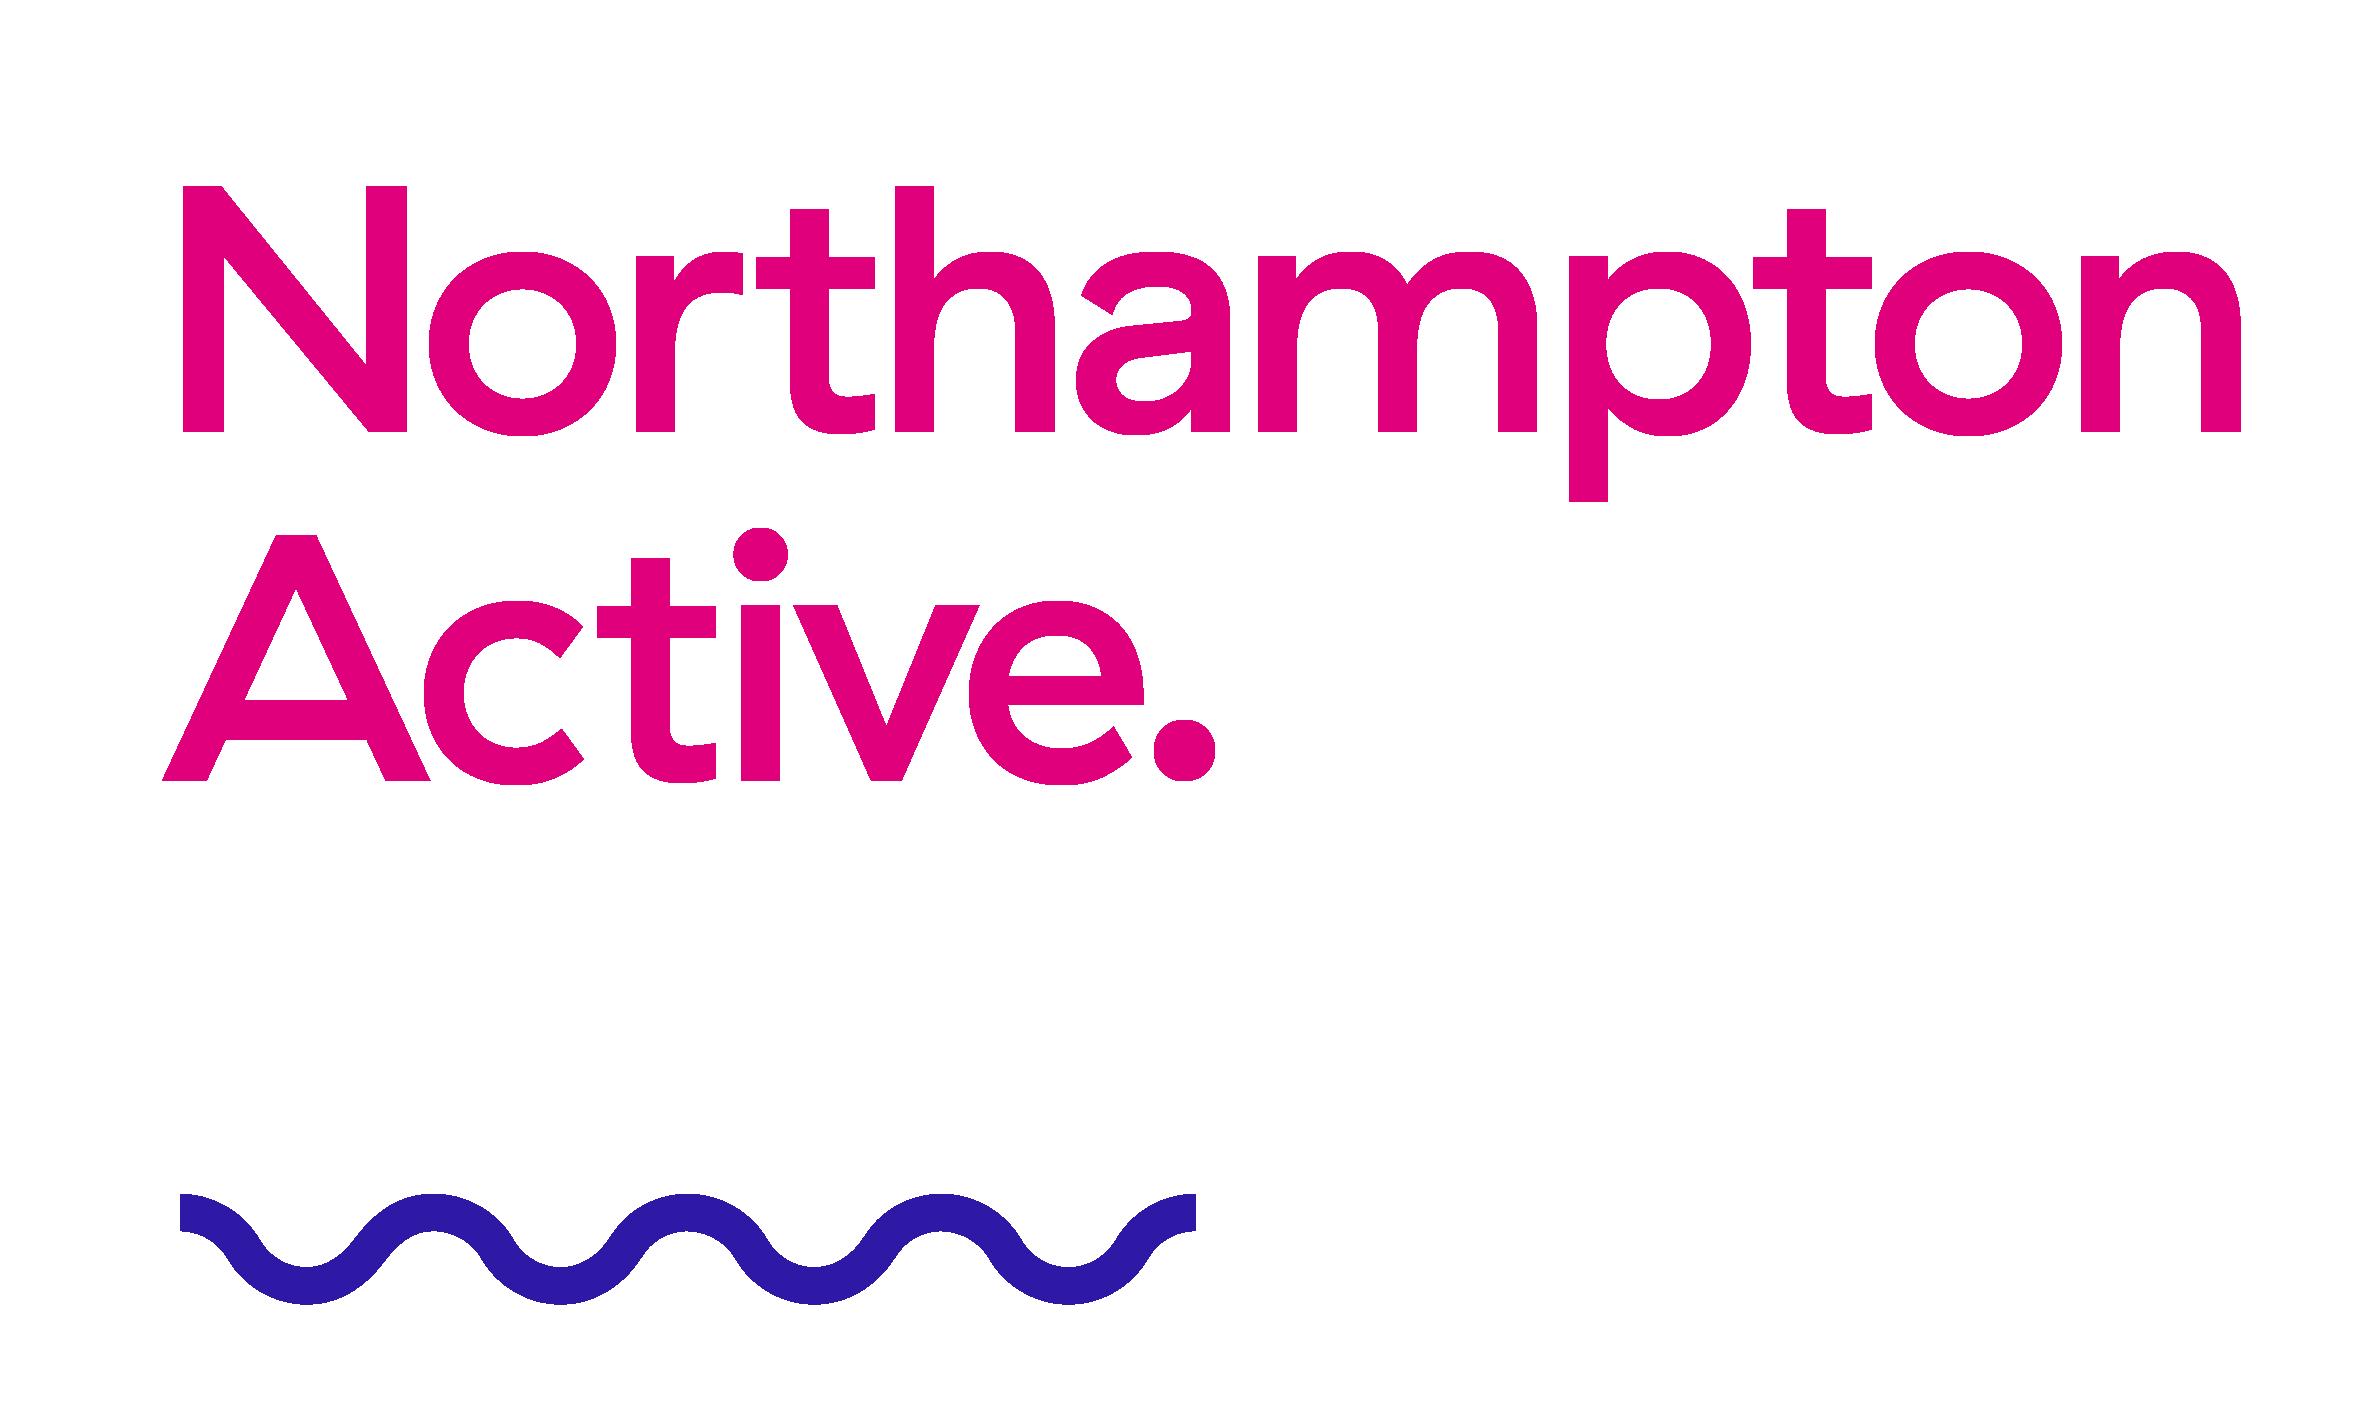 Northampton Active